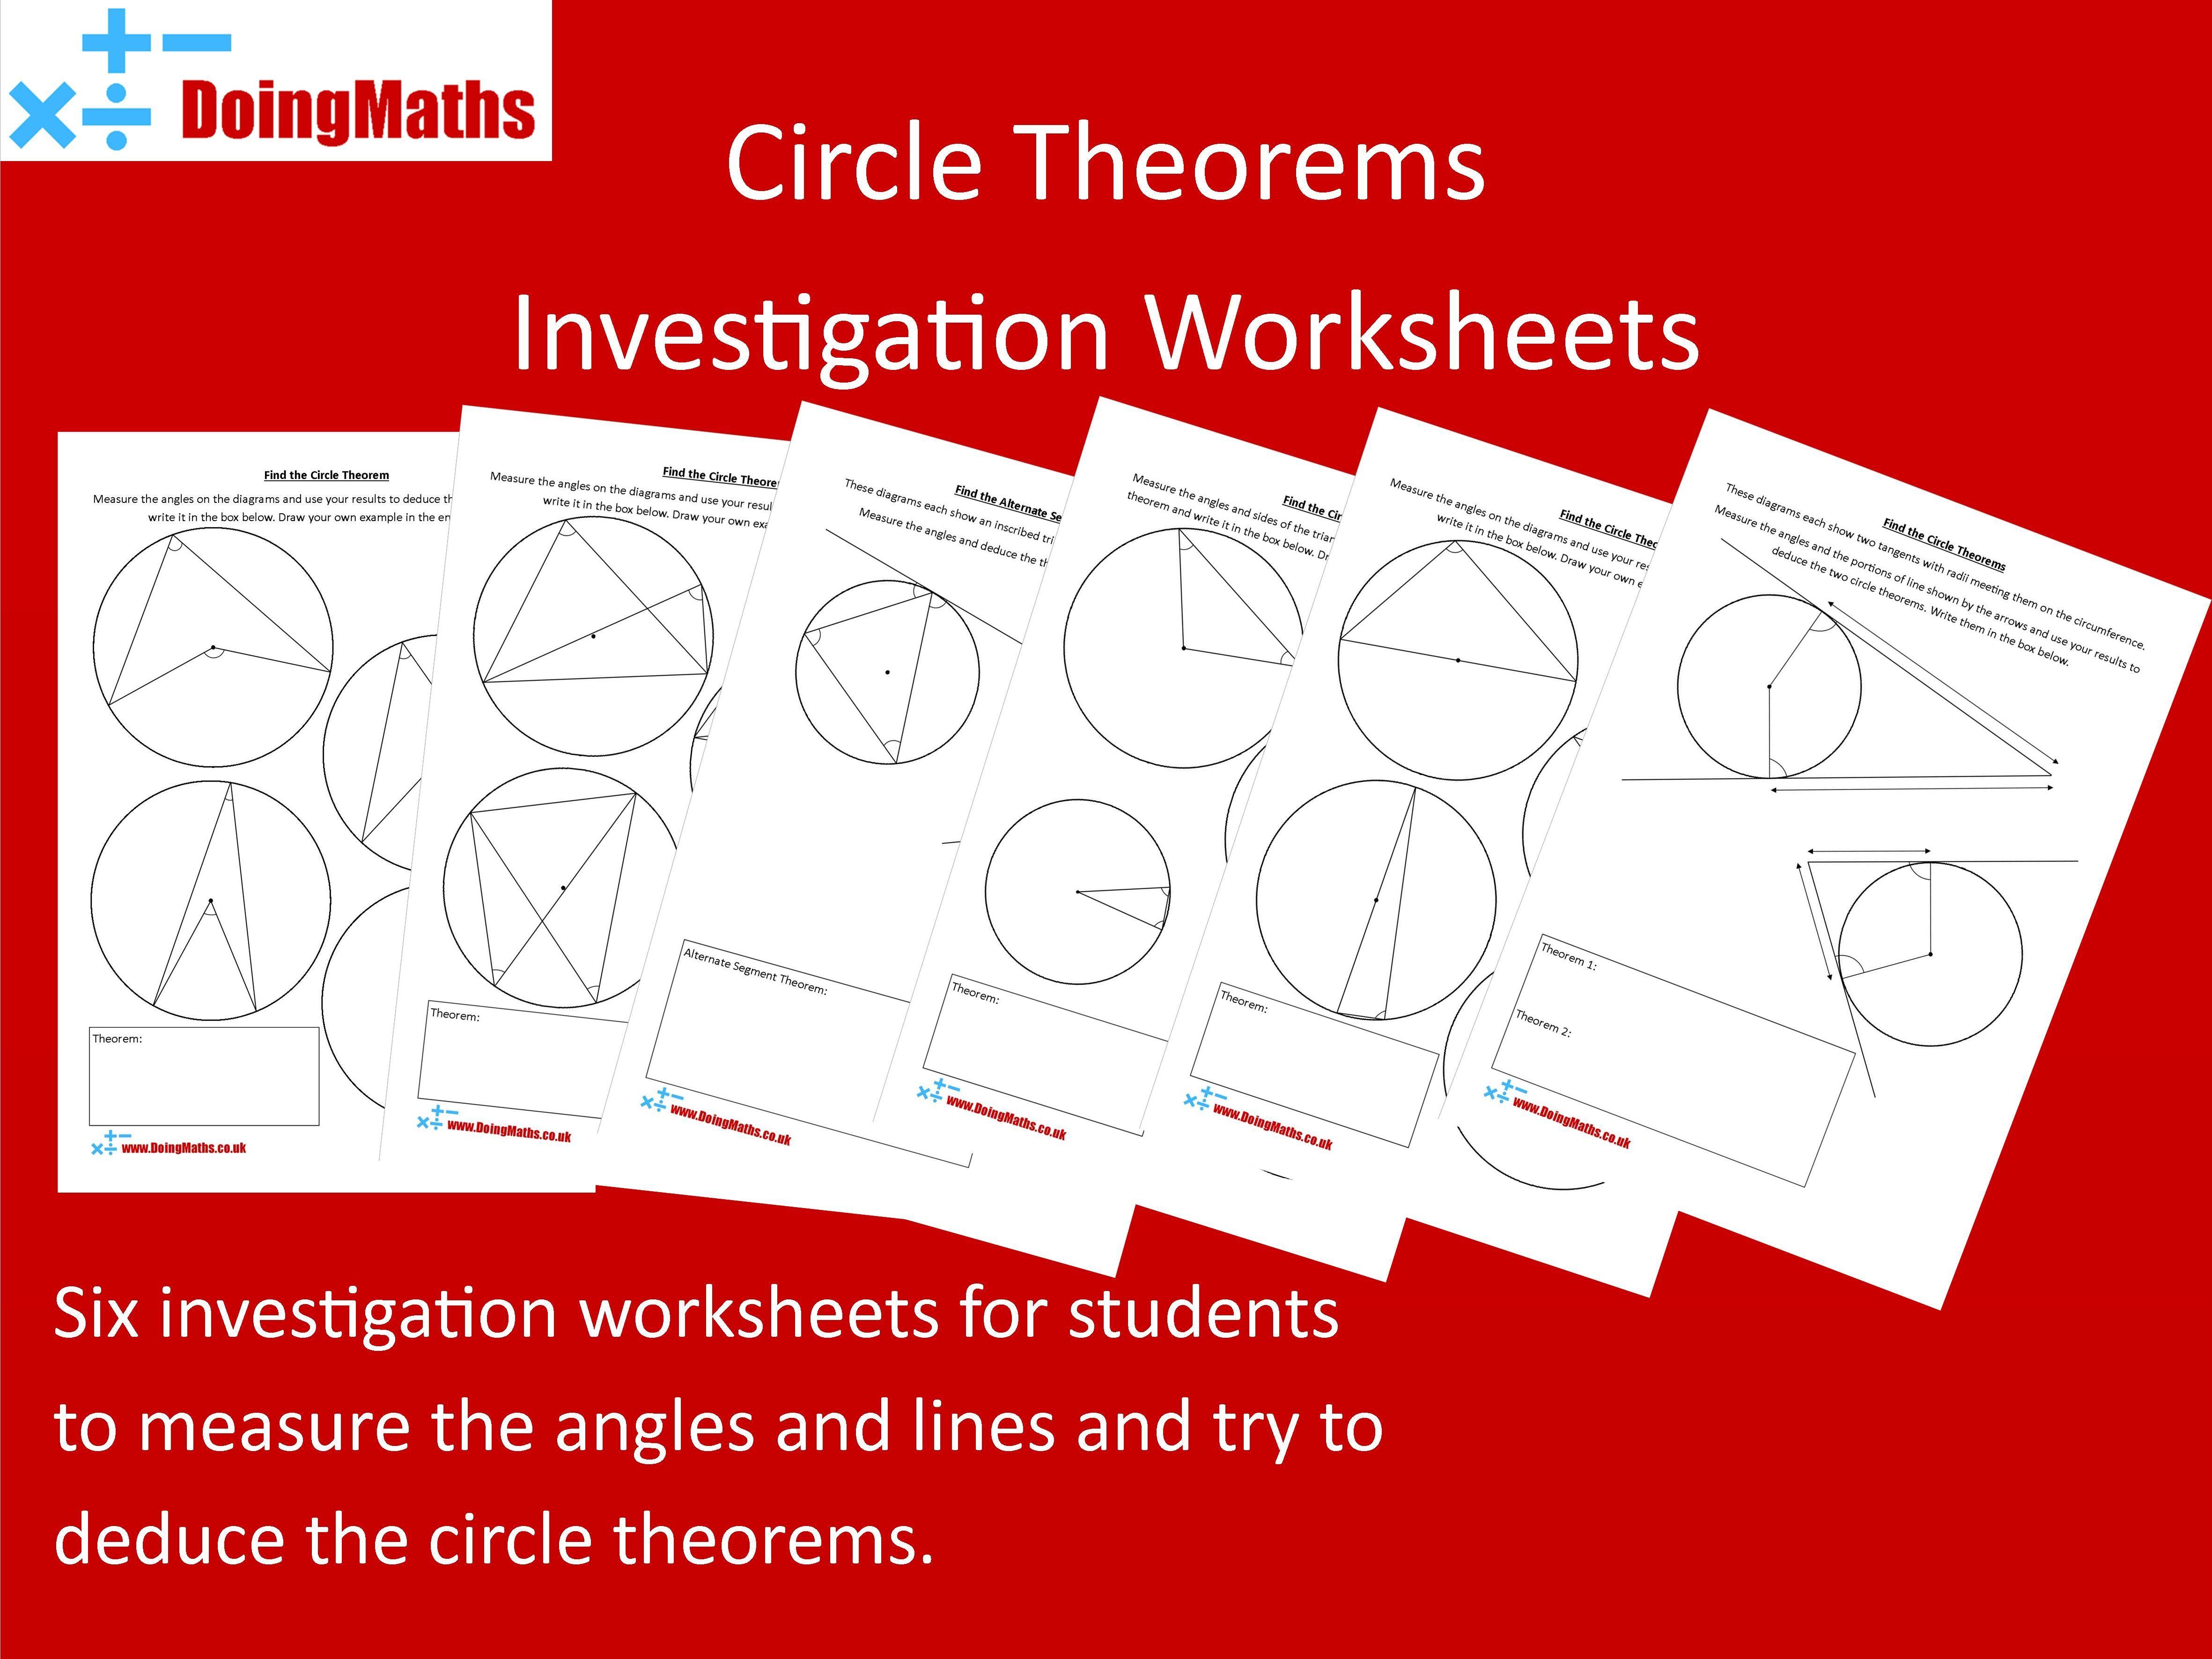 Circle Theorems Investigation Worksheets